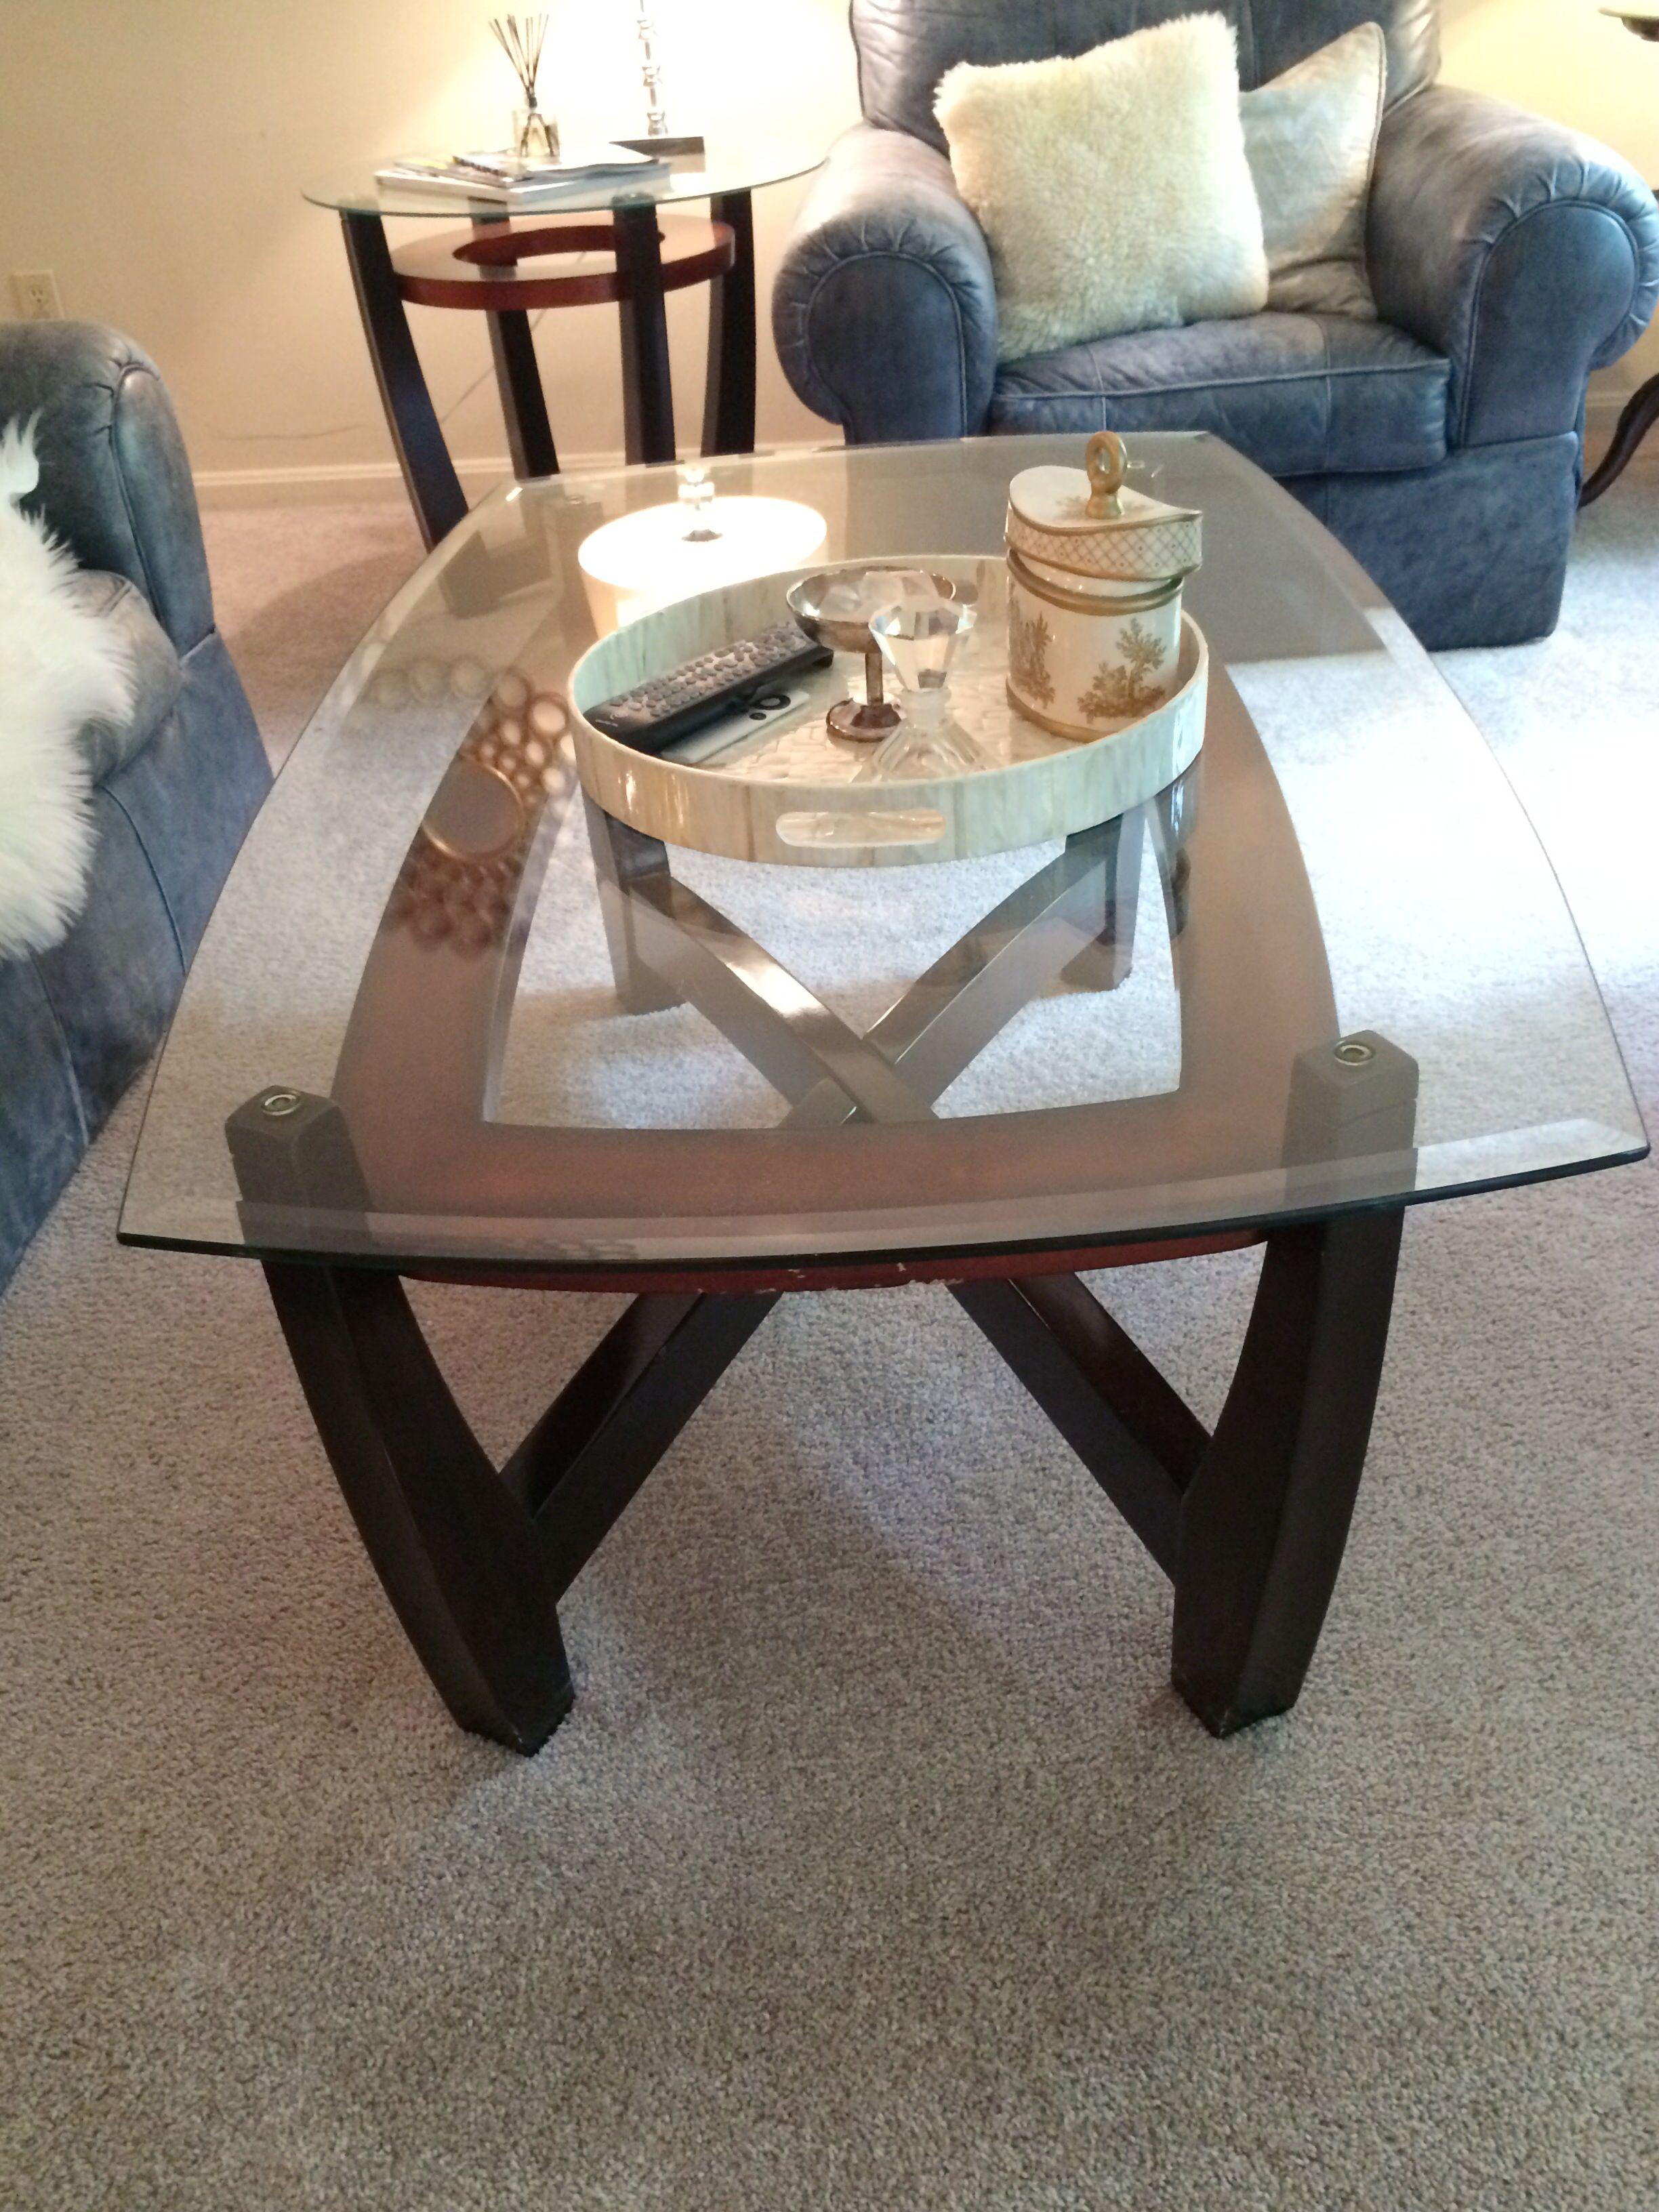 Dark Wood Coffee Table With Glass Top 50 X 30 X 20 Coffee Table Coffee Table Wood Dark Wood Coffee Table [ 3264 x 2448 Pixel ]